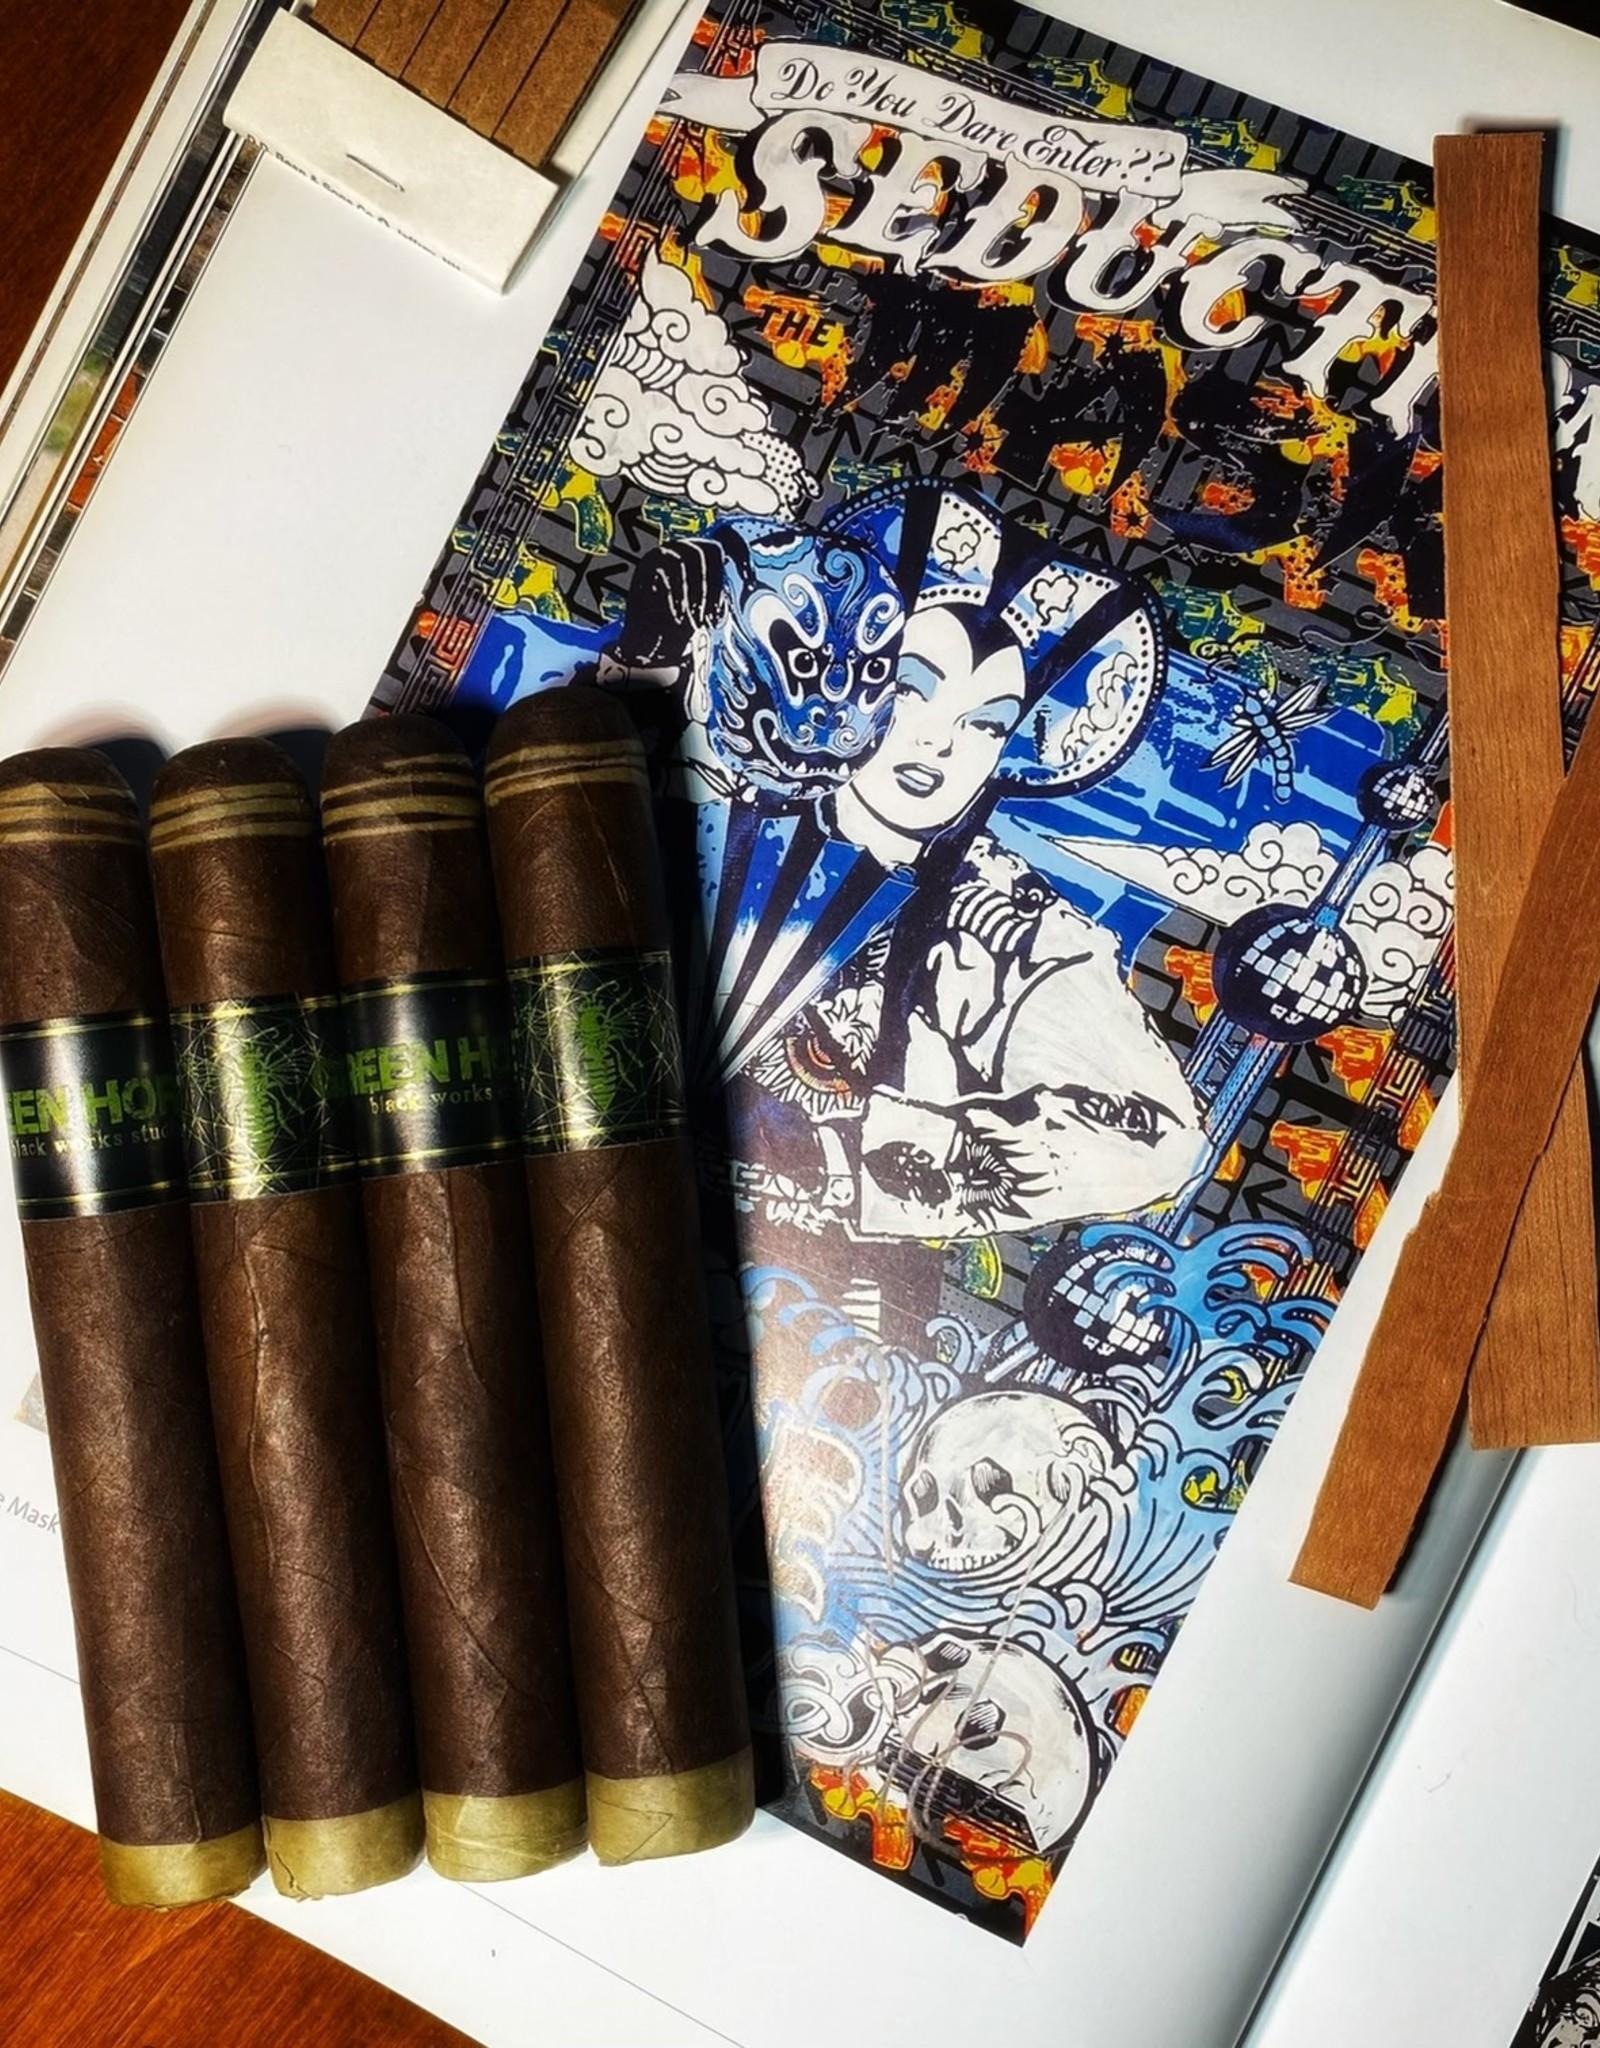 Black Label Trading Co BLTC Green Hornet Robusto 5 x 48